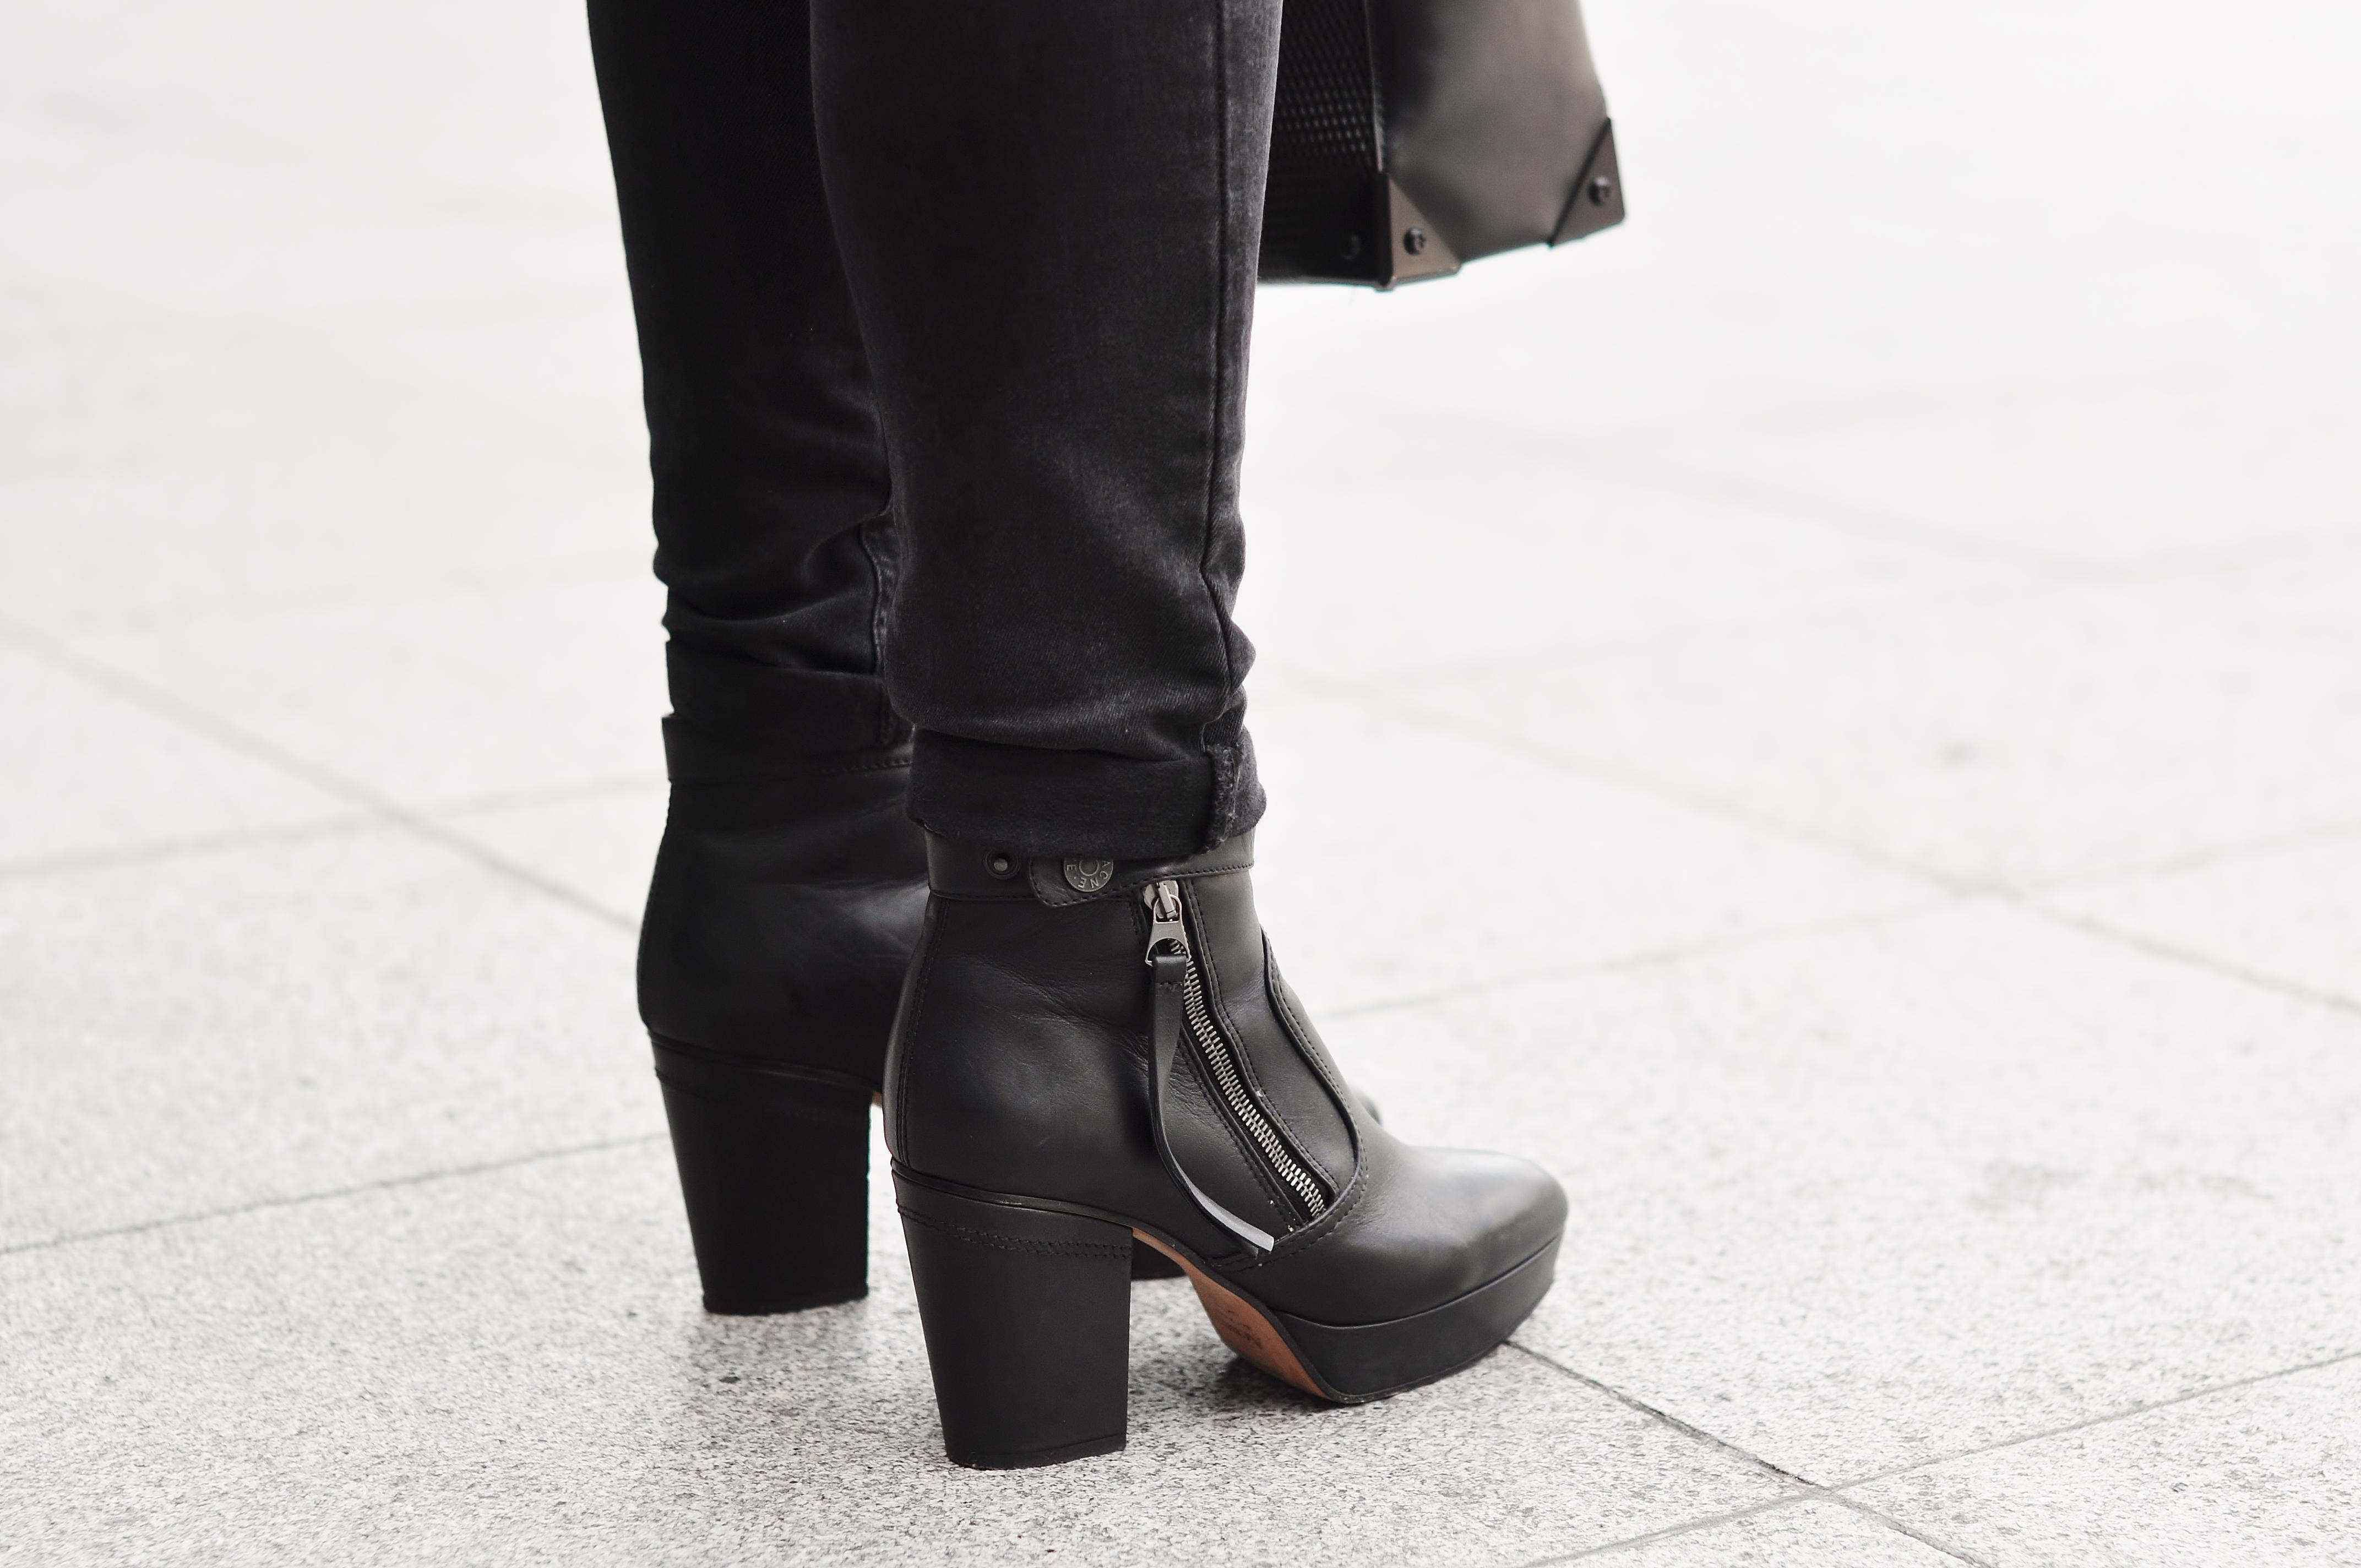 acne track boots rea